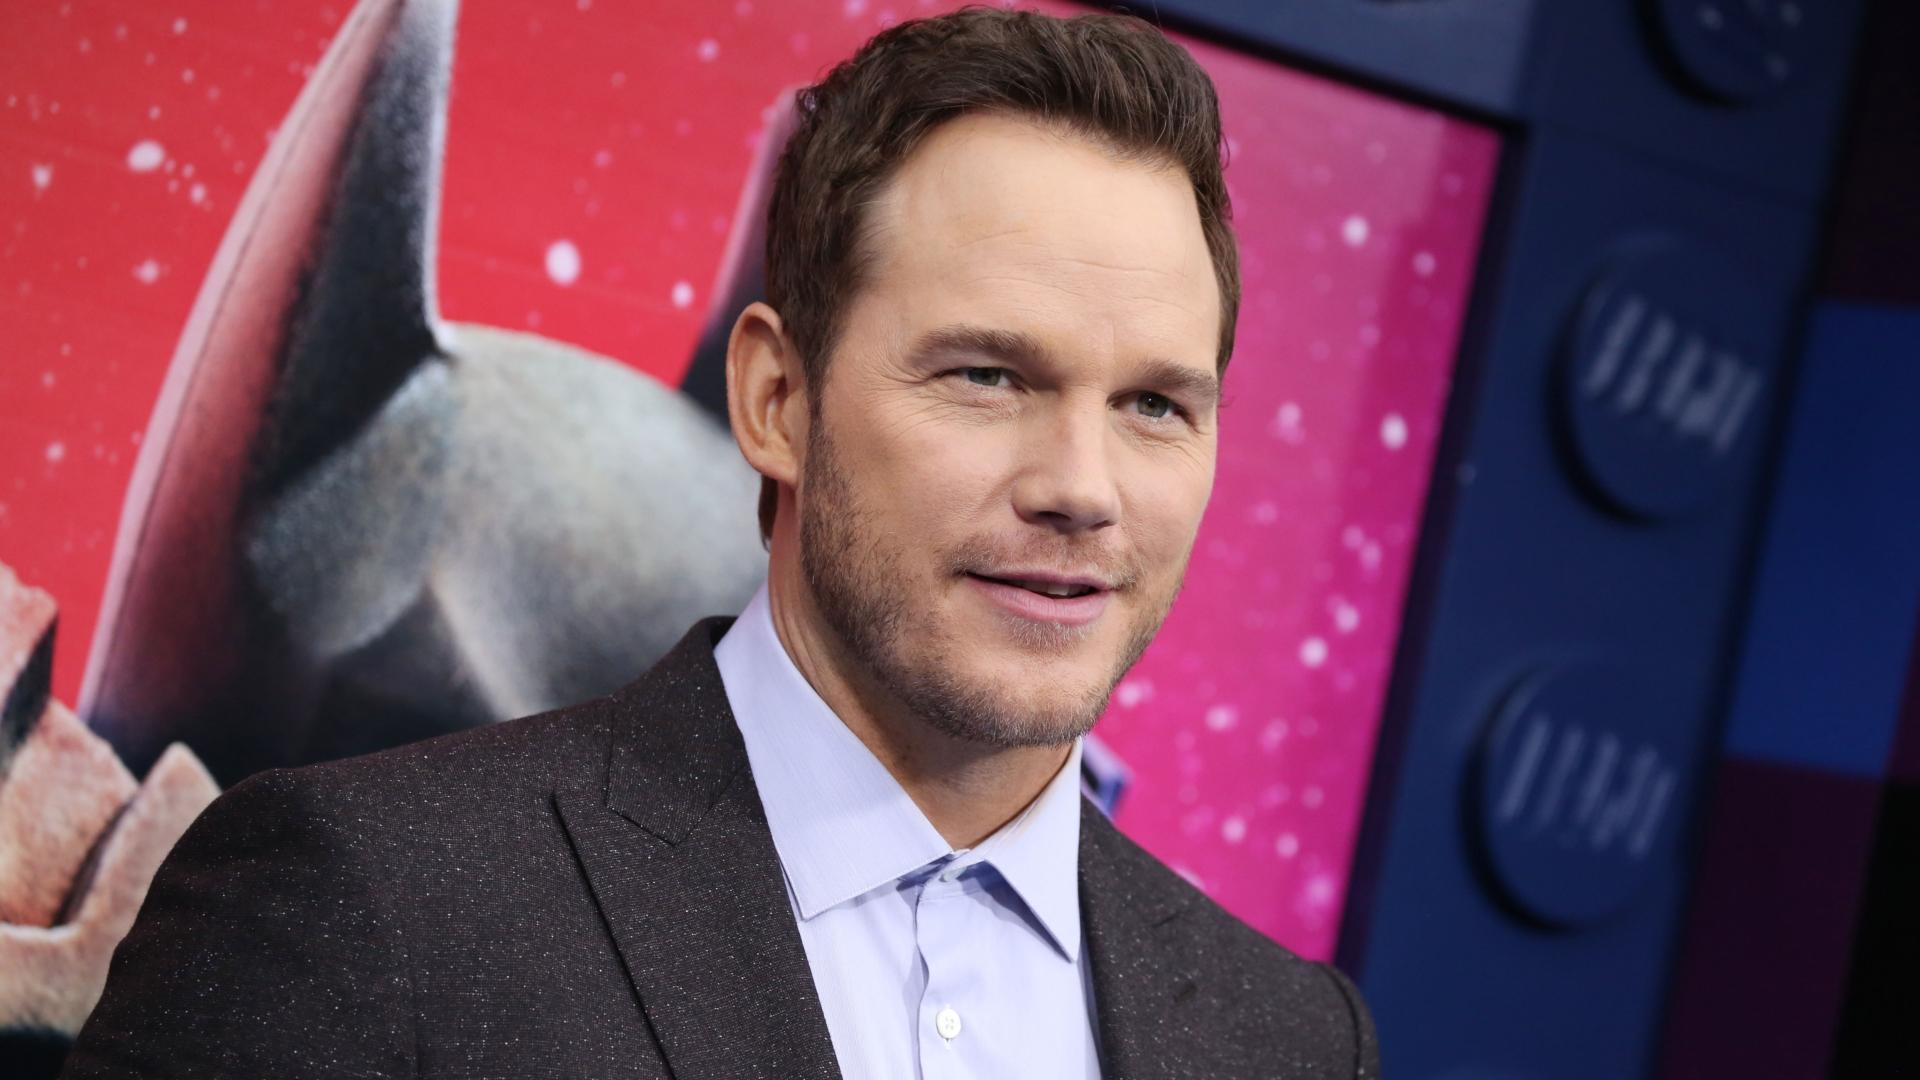 Chris Pratt Was Criticized for Snubbing Anna Faris & His Son in His Wedding  Instagram